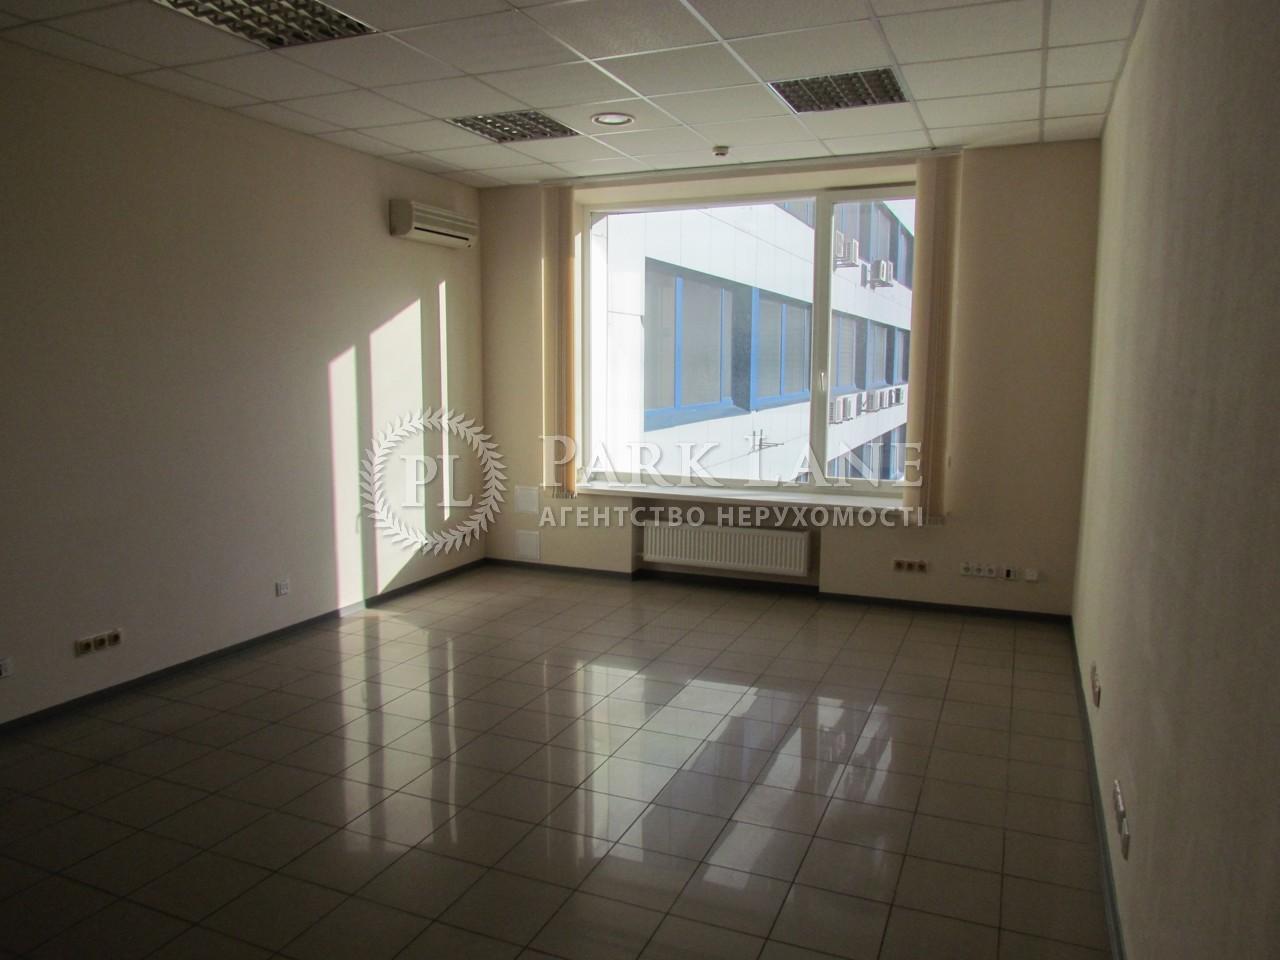 Офис, Леси Украинки бульв., Киев, H-41464 - Фото 3